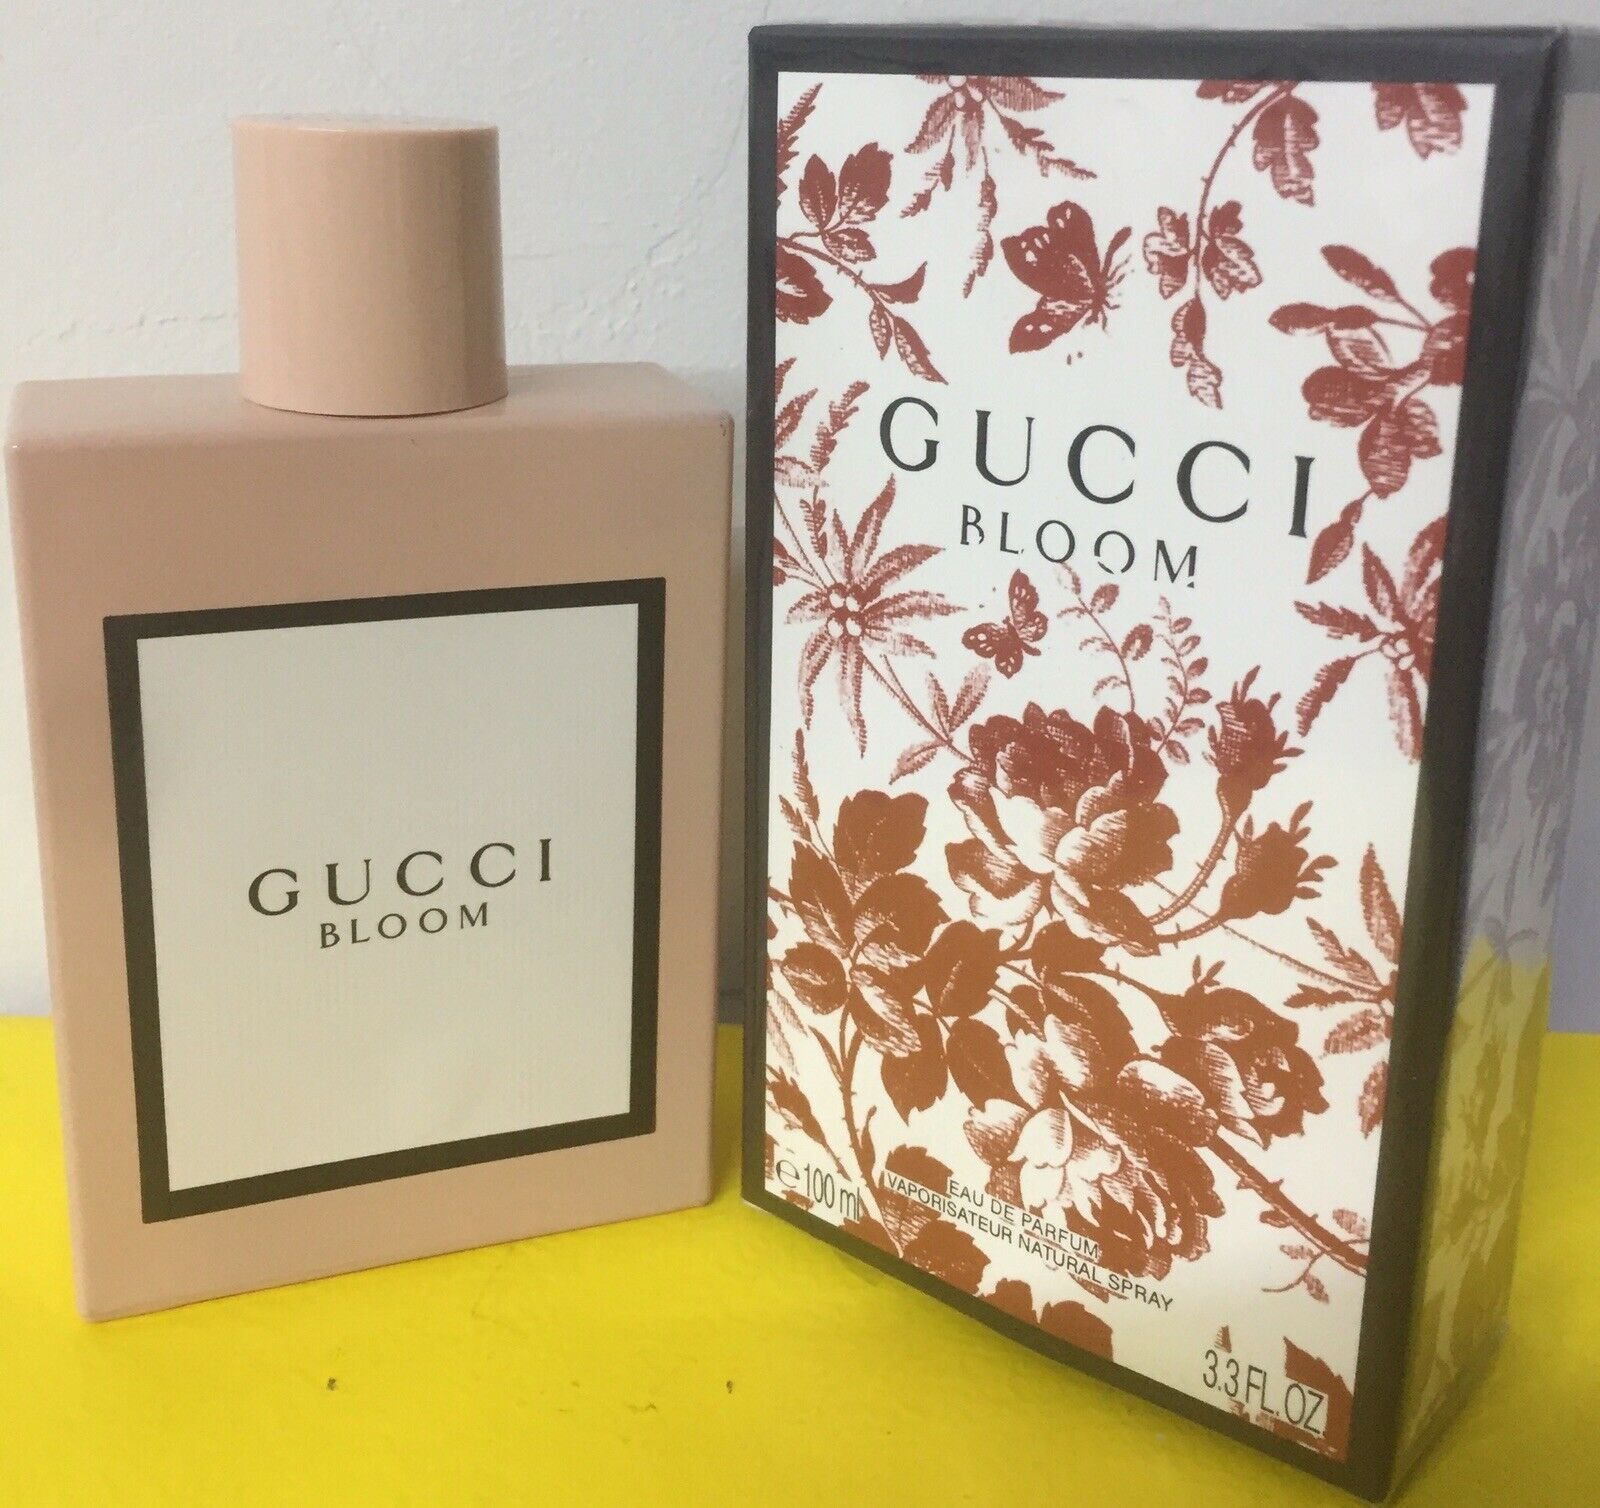 647cf0f13 Buy Gucci Bloom Perfume 3.3oz. Eau de Parfum Spray for Women. Brand new